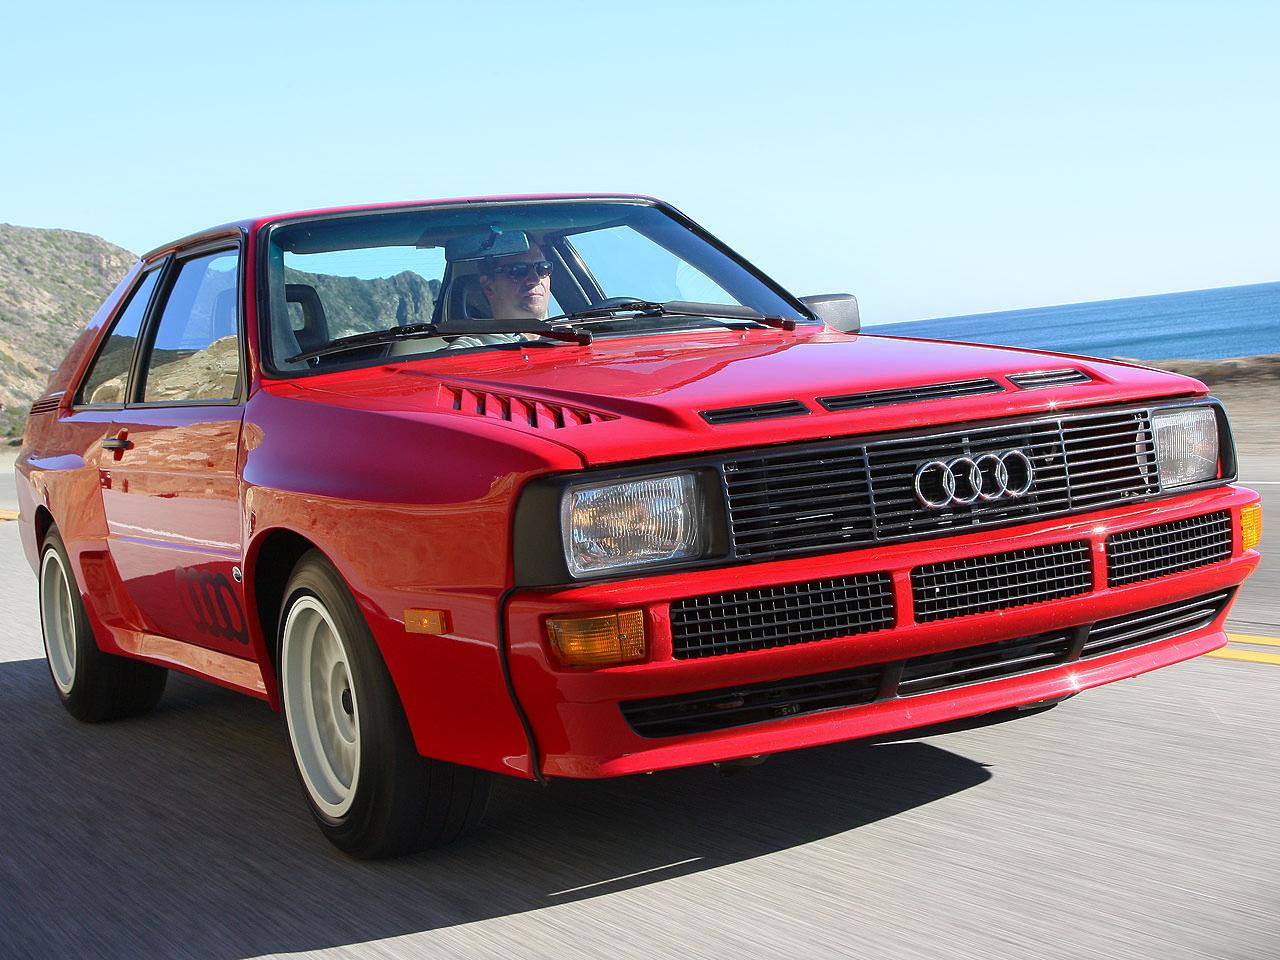 Lancia Hyena vs Audi Sport Quattro